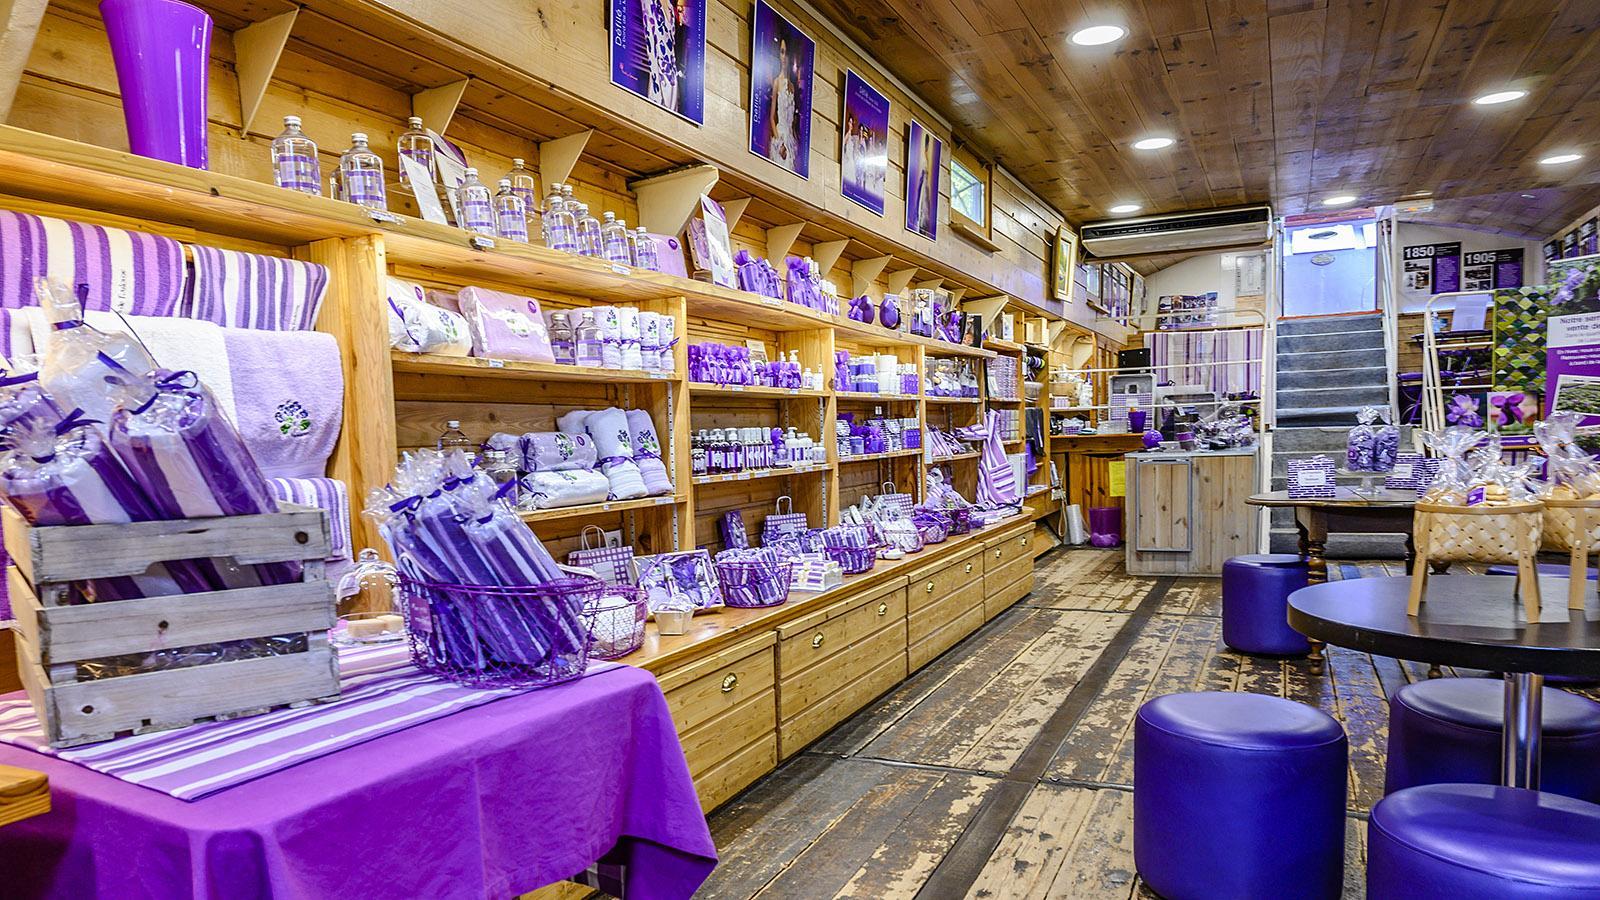 Die große Vielfalt des Veilchens: la maison de la violette. Foto: Hilke Maunder